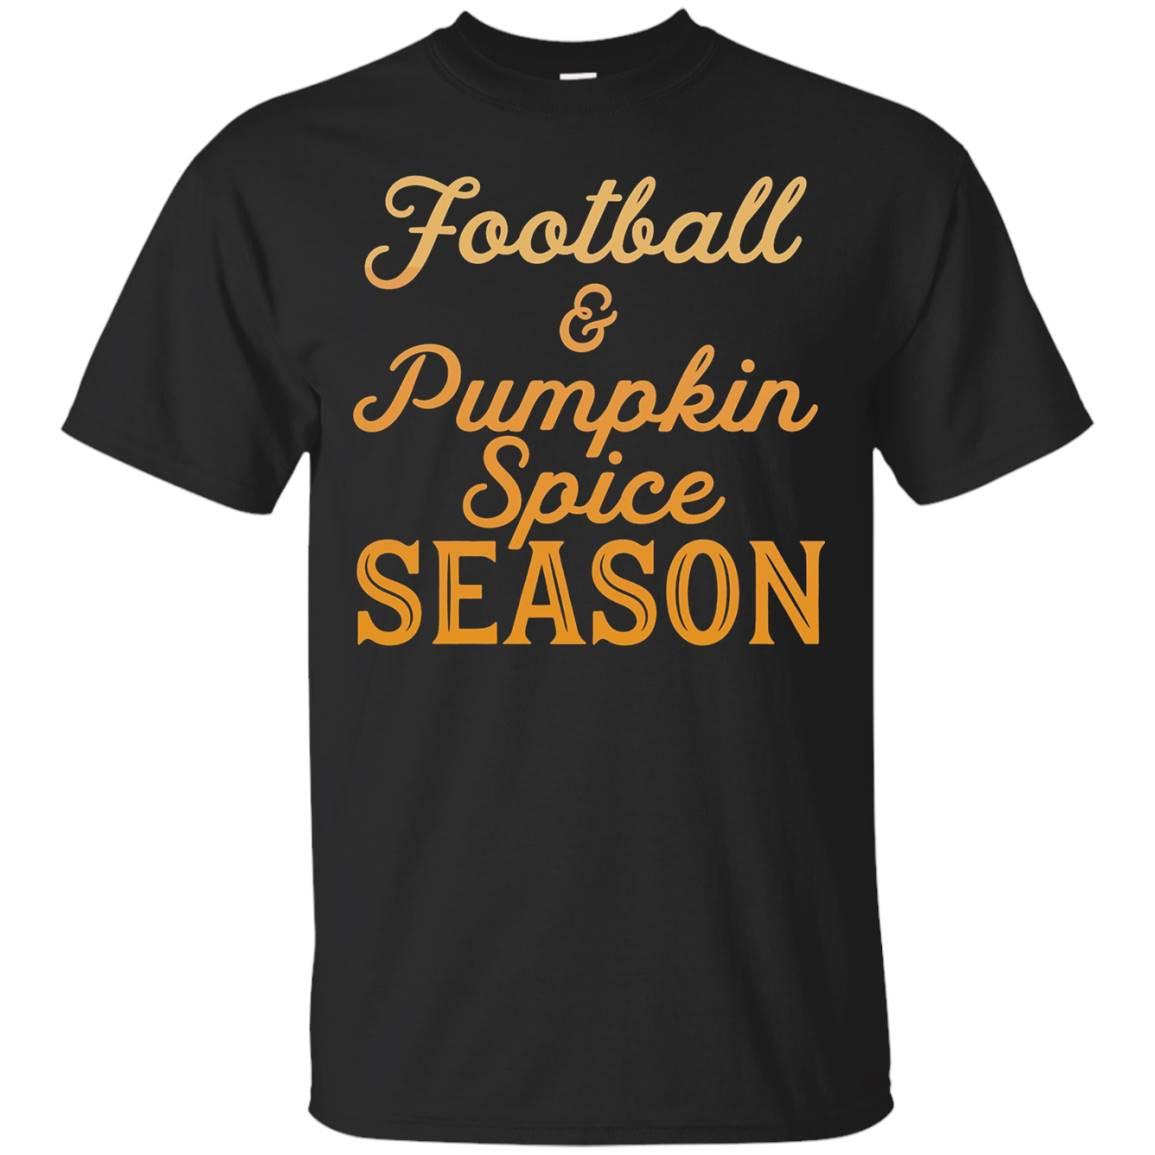 Football and Pumpkin Spice Season